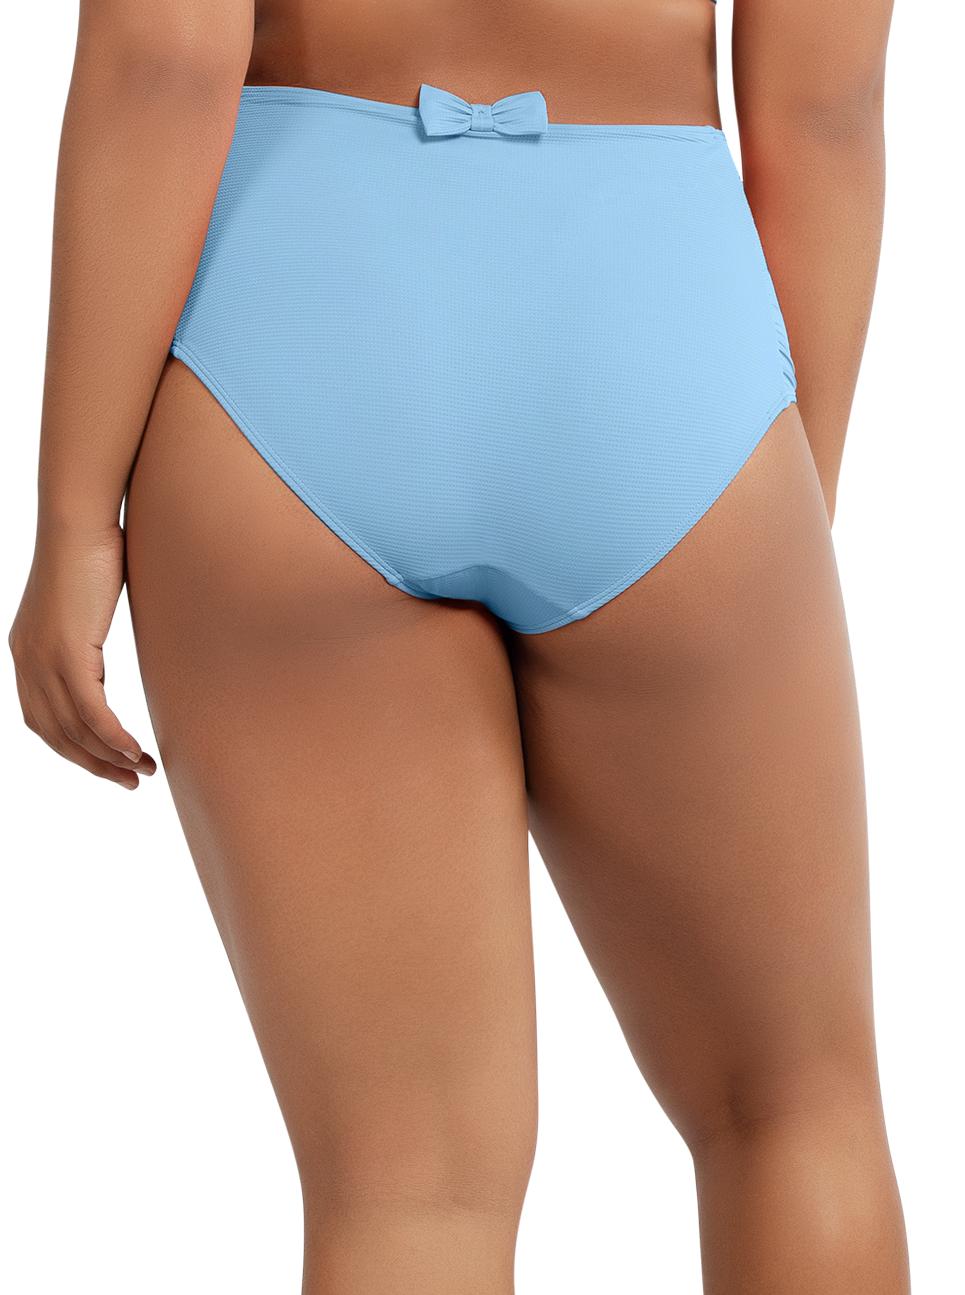 PARFAIT Vivien HighwaistedBottomS8165 DreamBlue Black - Vivien Highwaisted Bottom Dream Blue S8165